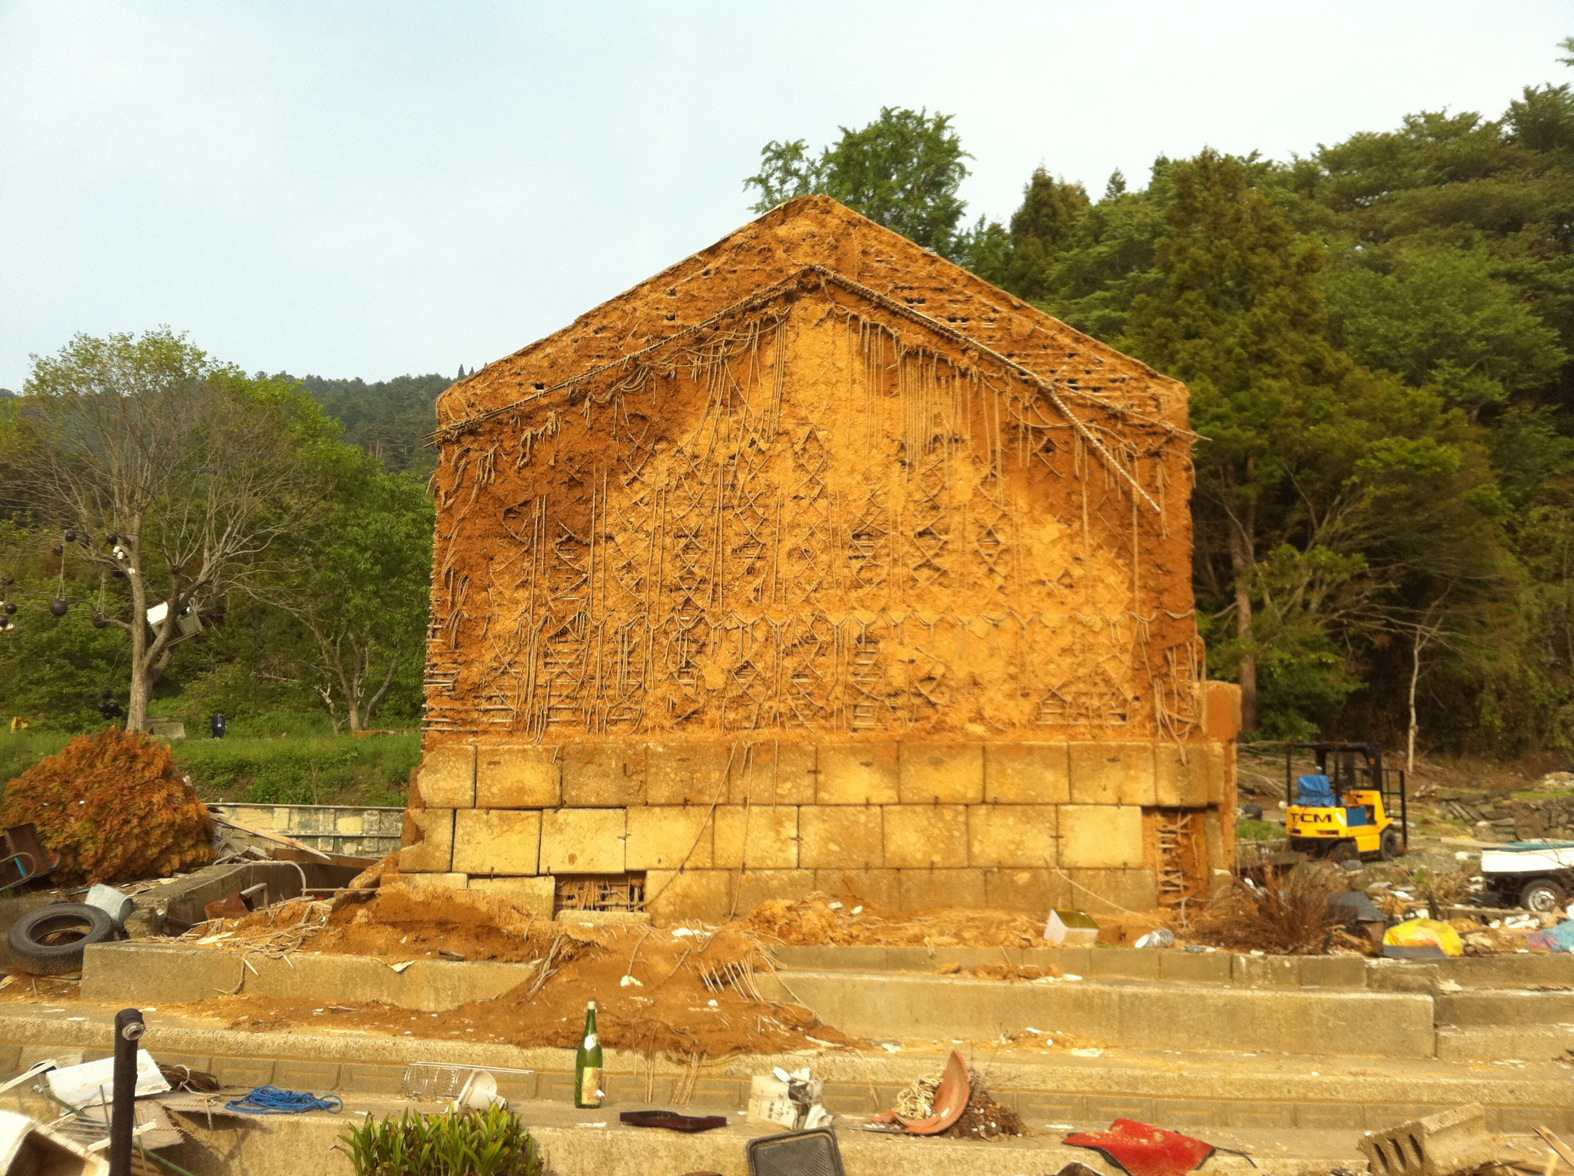 This <i>kura</i>, a traditional storehouse, survived the tsunami. Photo by Maiko Sugawara.